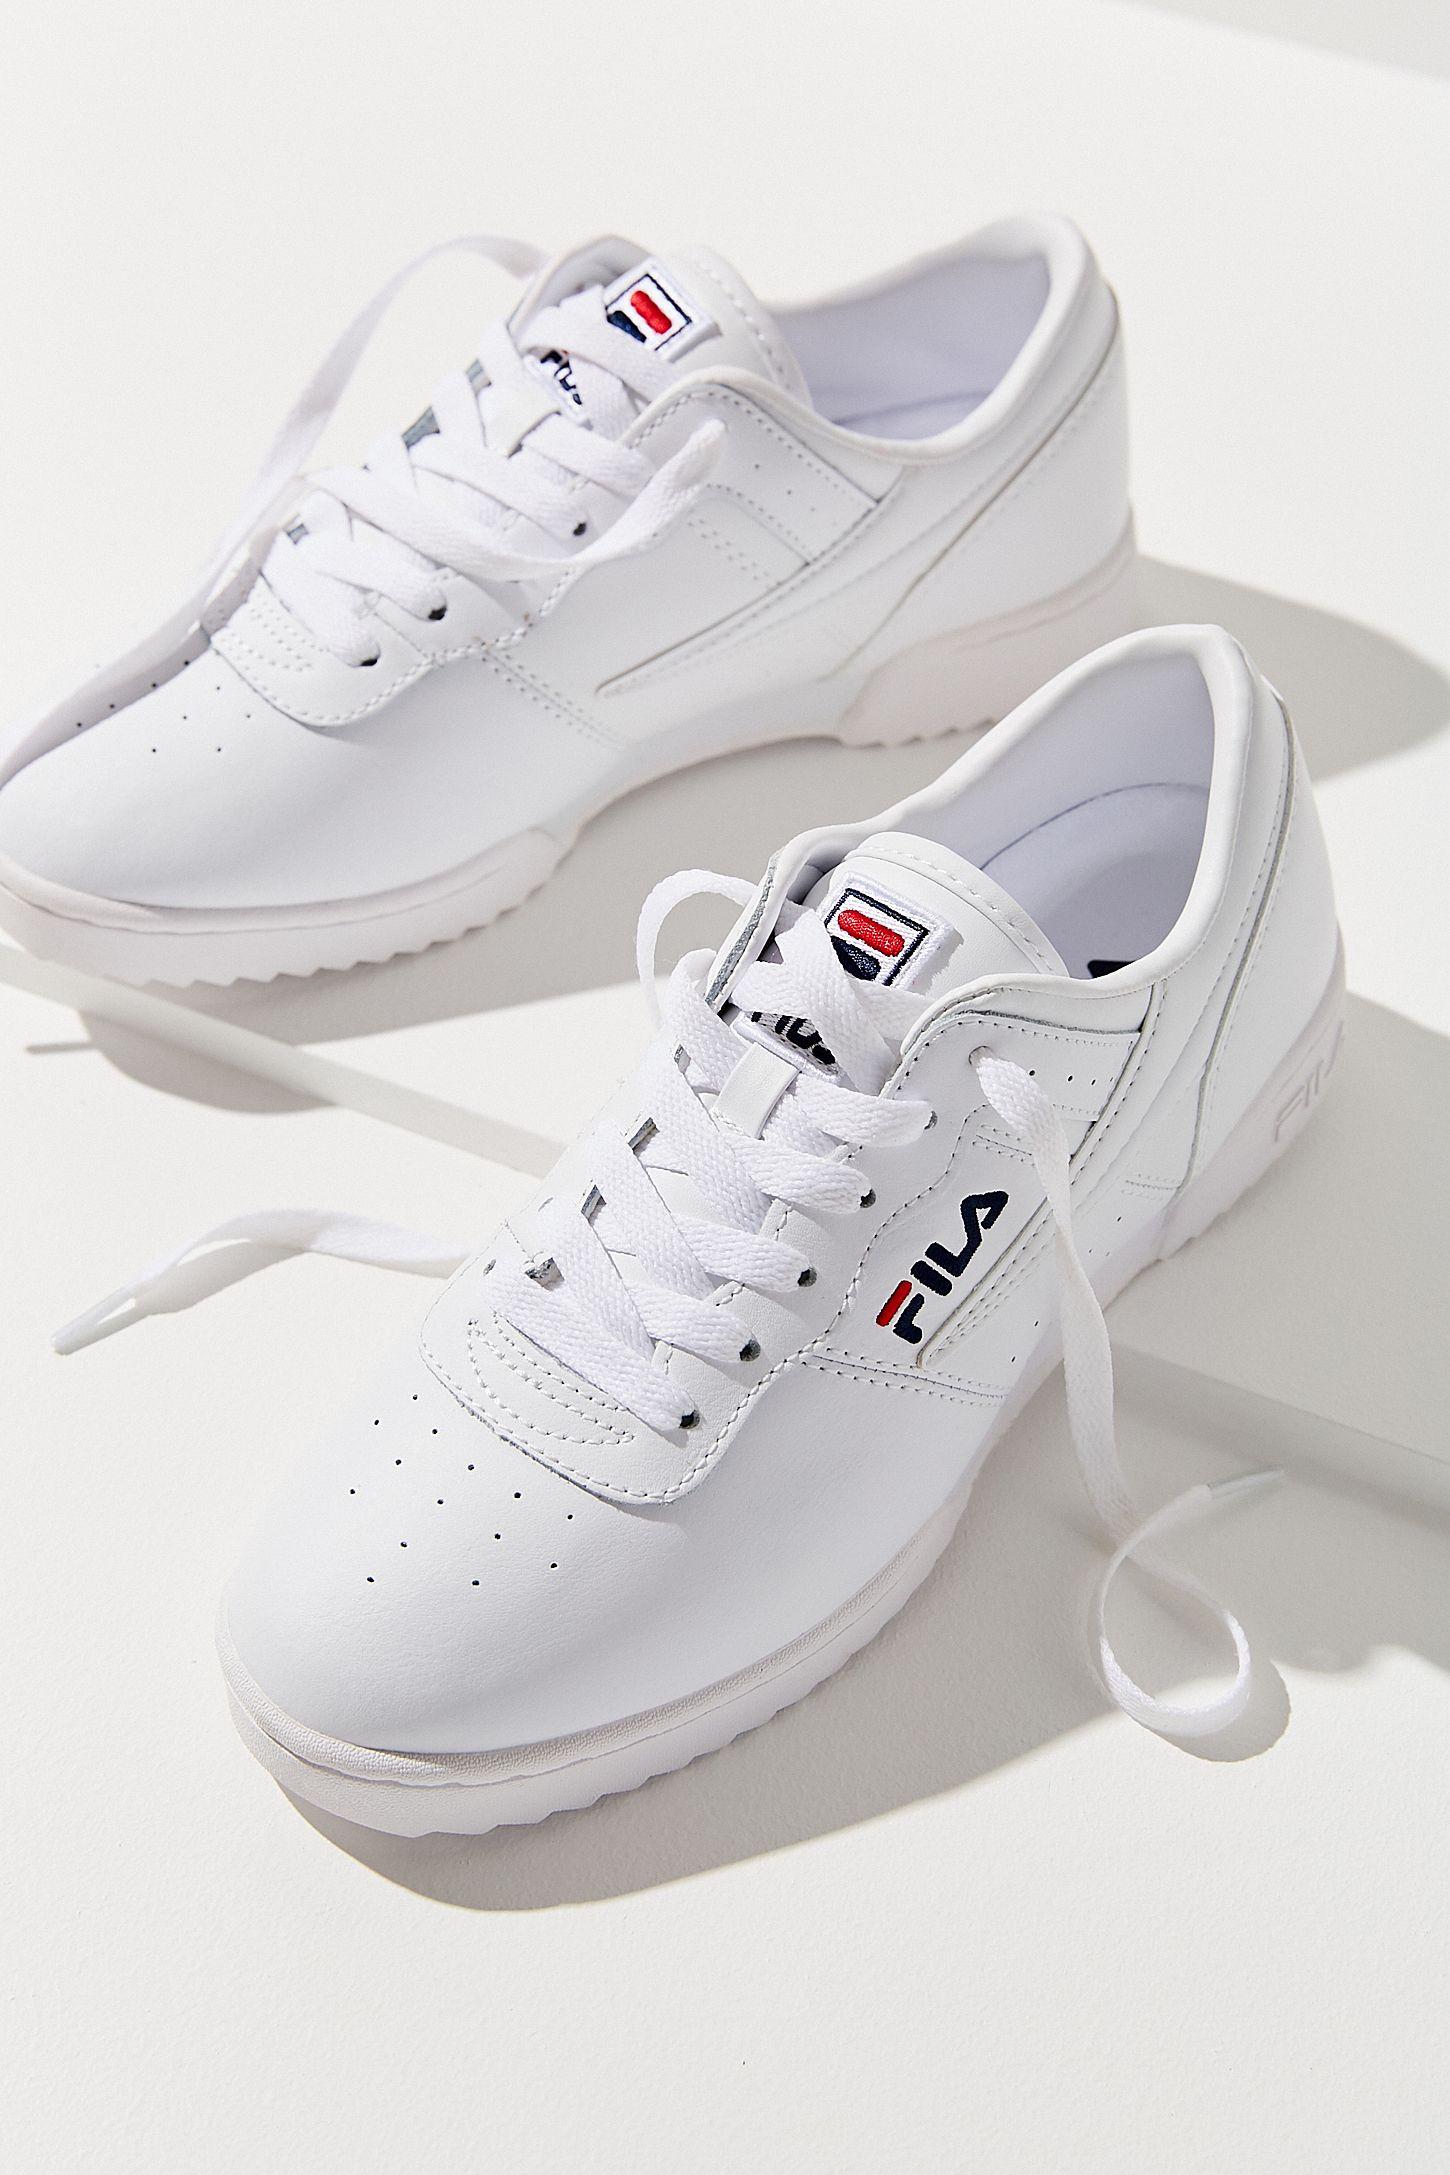 89c5015de794 FILA Original Fitness Ripple Sneaker